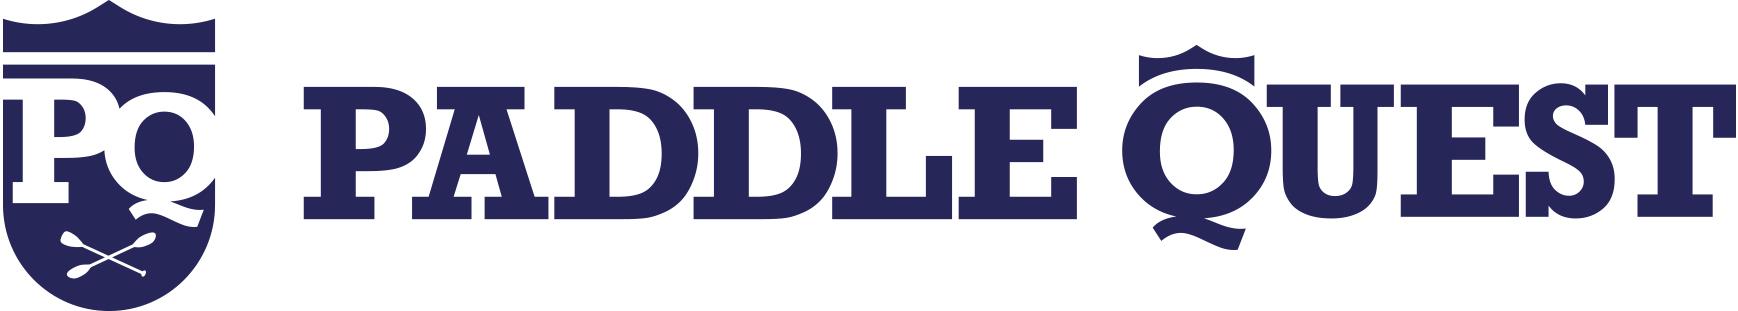 paddlequest_logomark_n